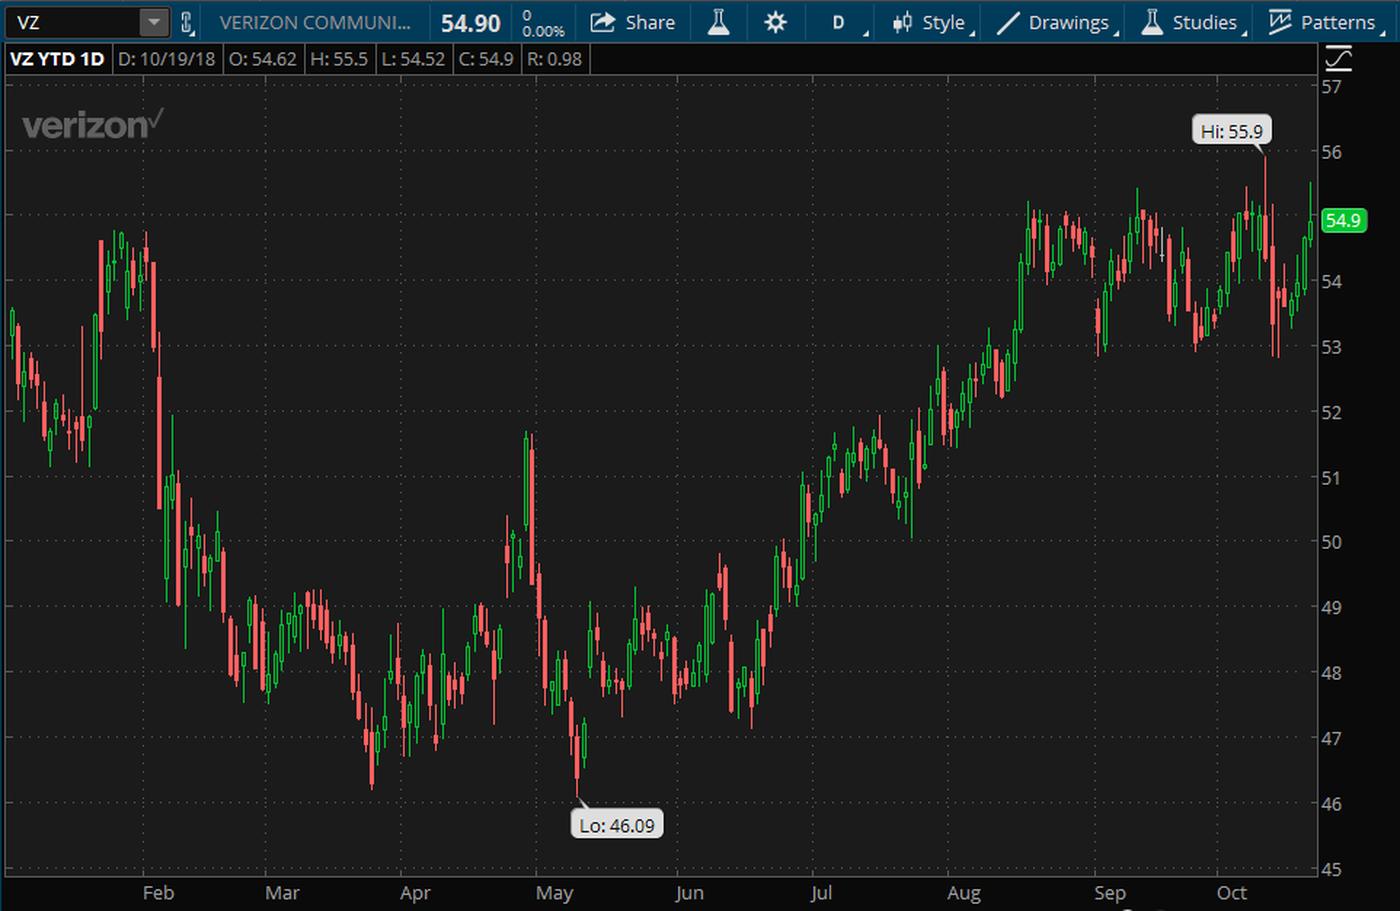 vz-earnings-stock-chart-eps-revenue-verizon-communications.png